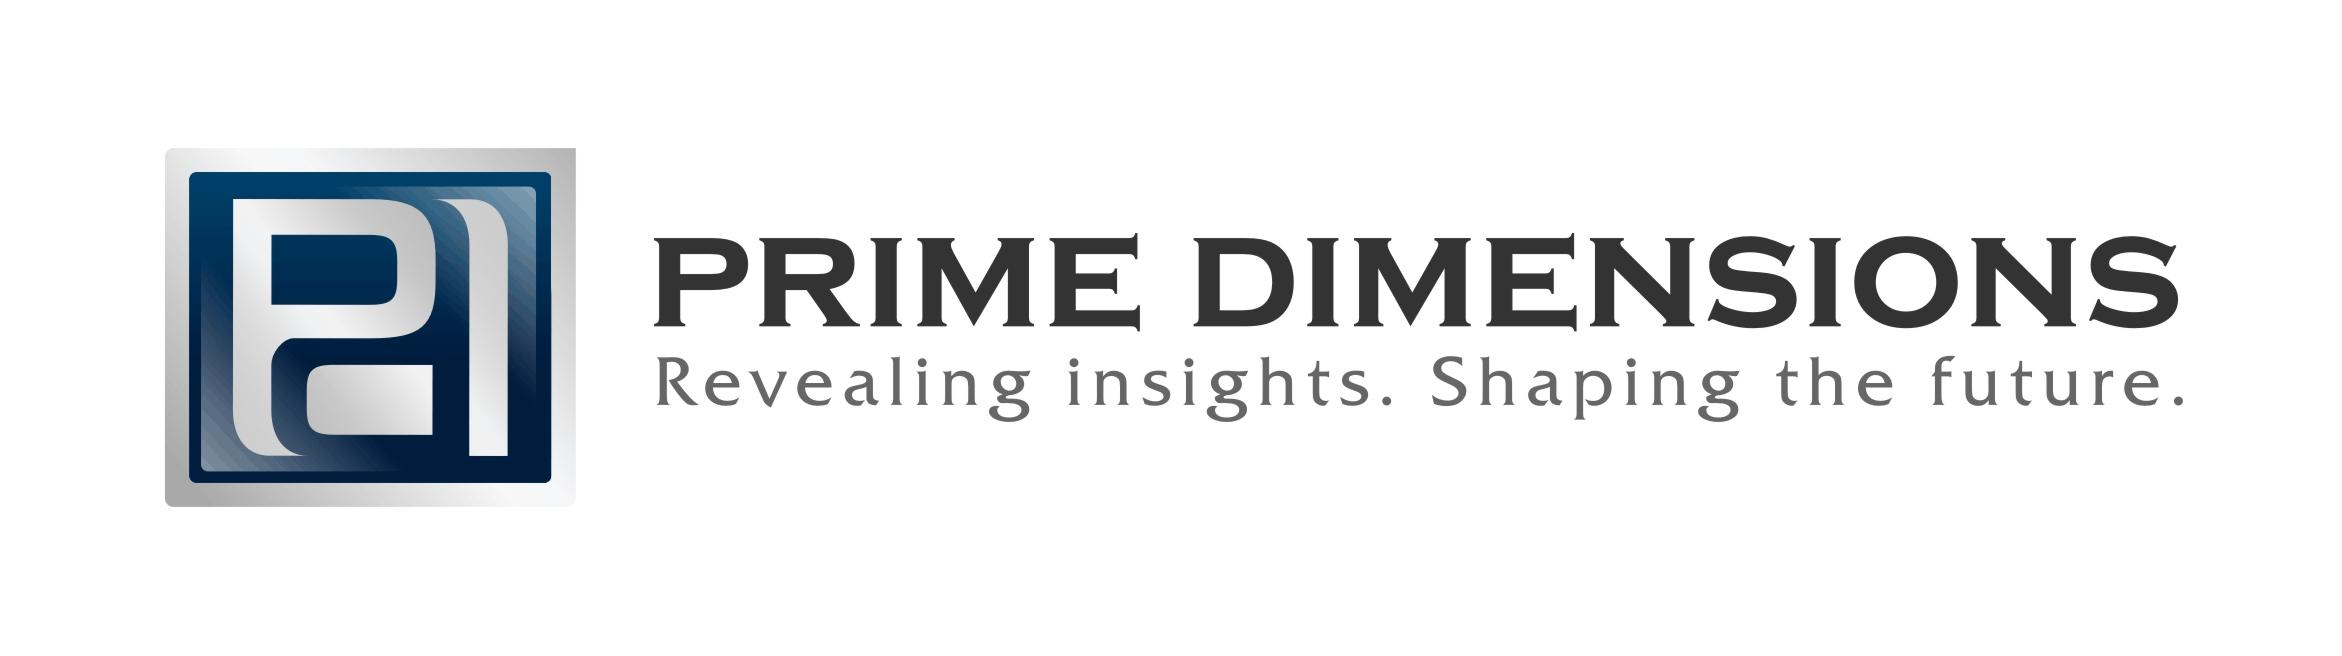 Prime Dimensions - alt2 - JPG